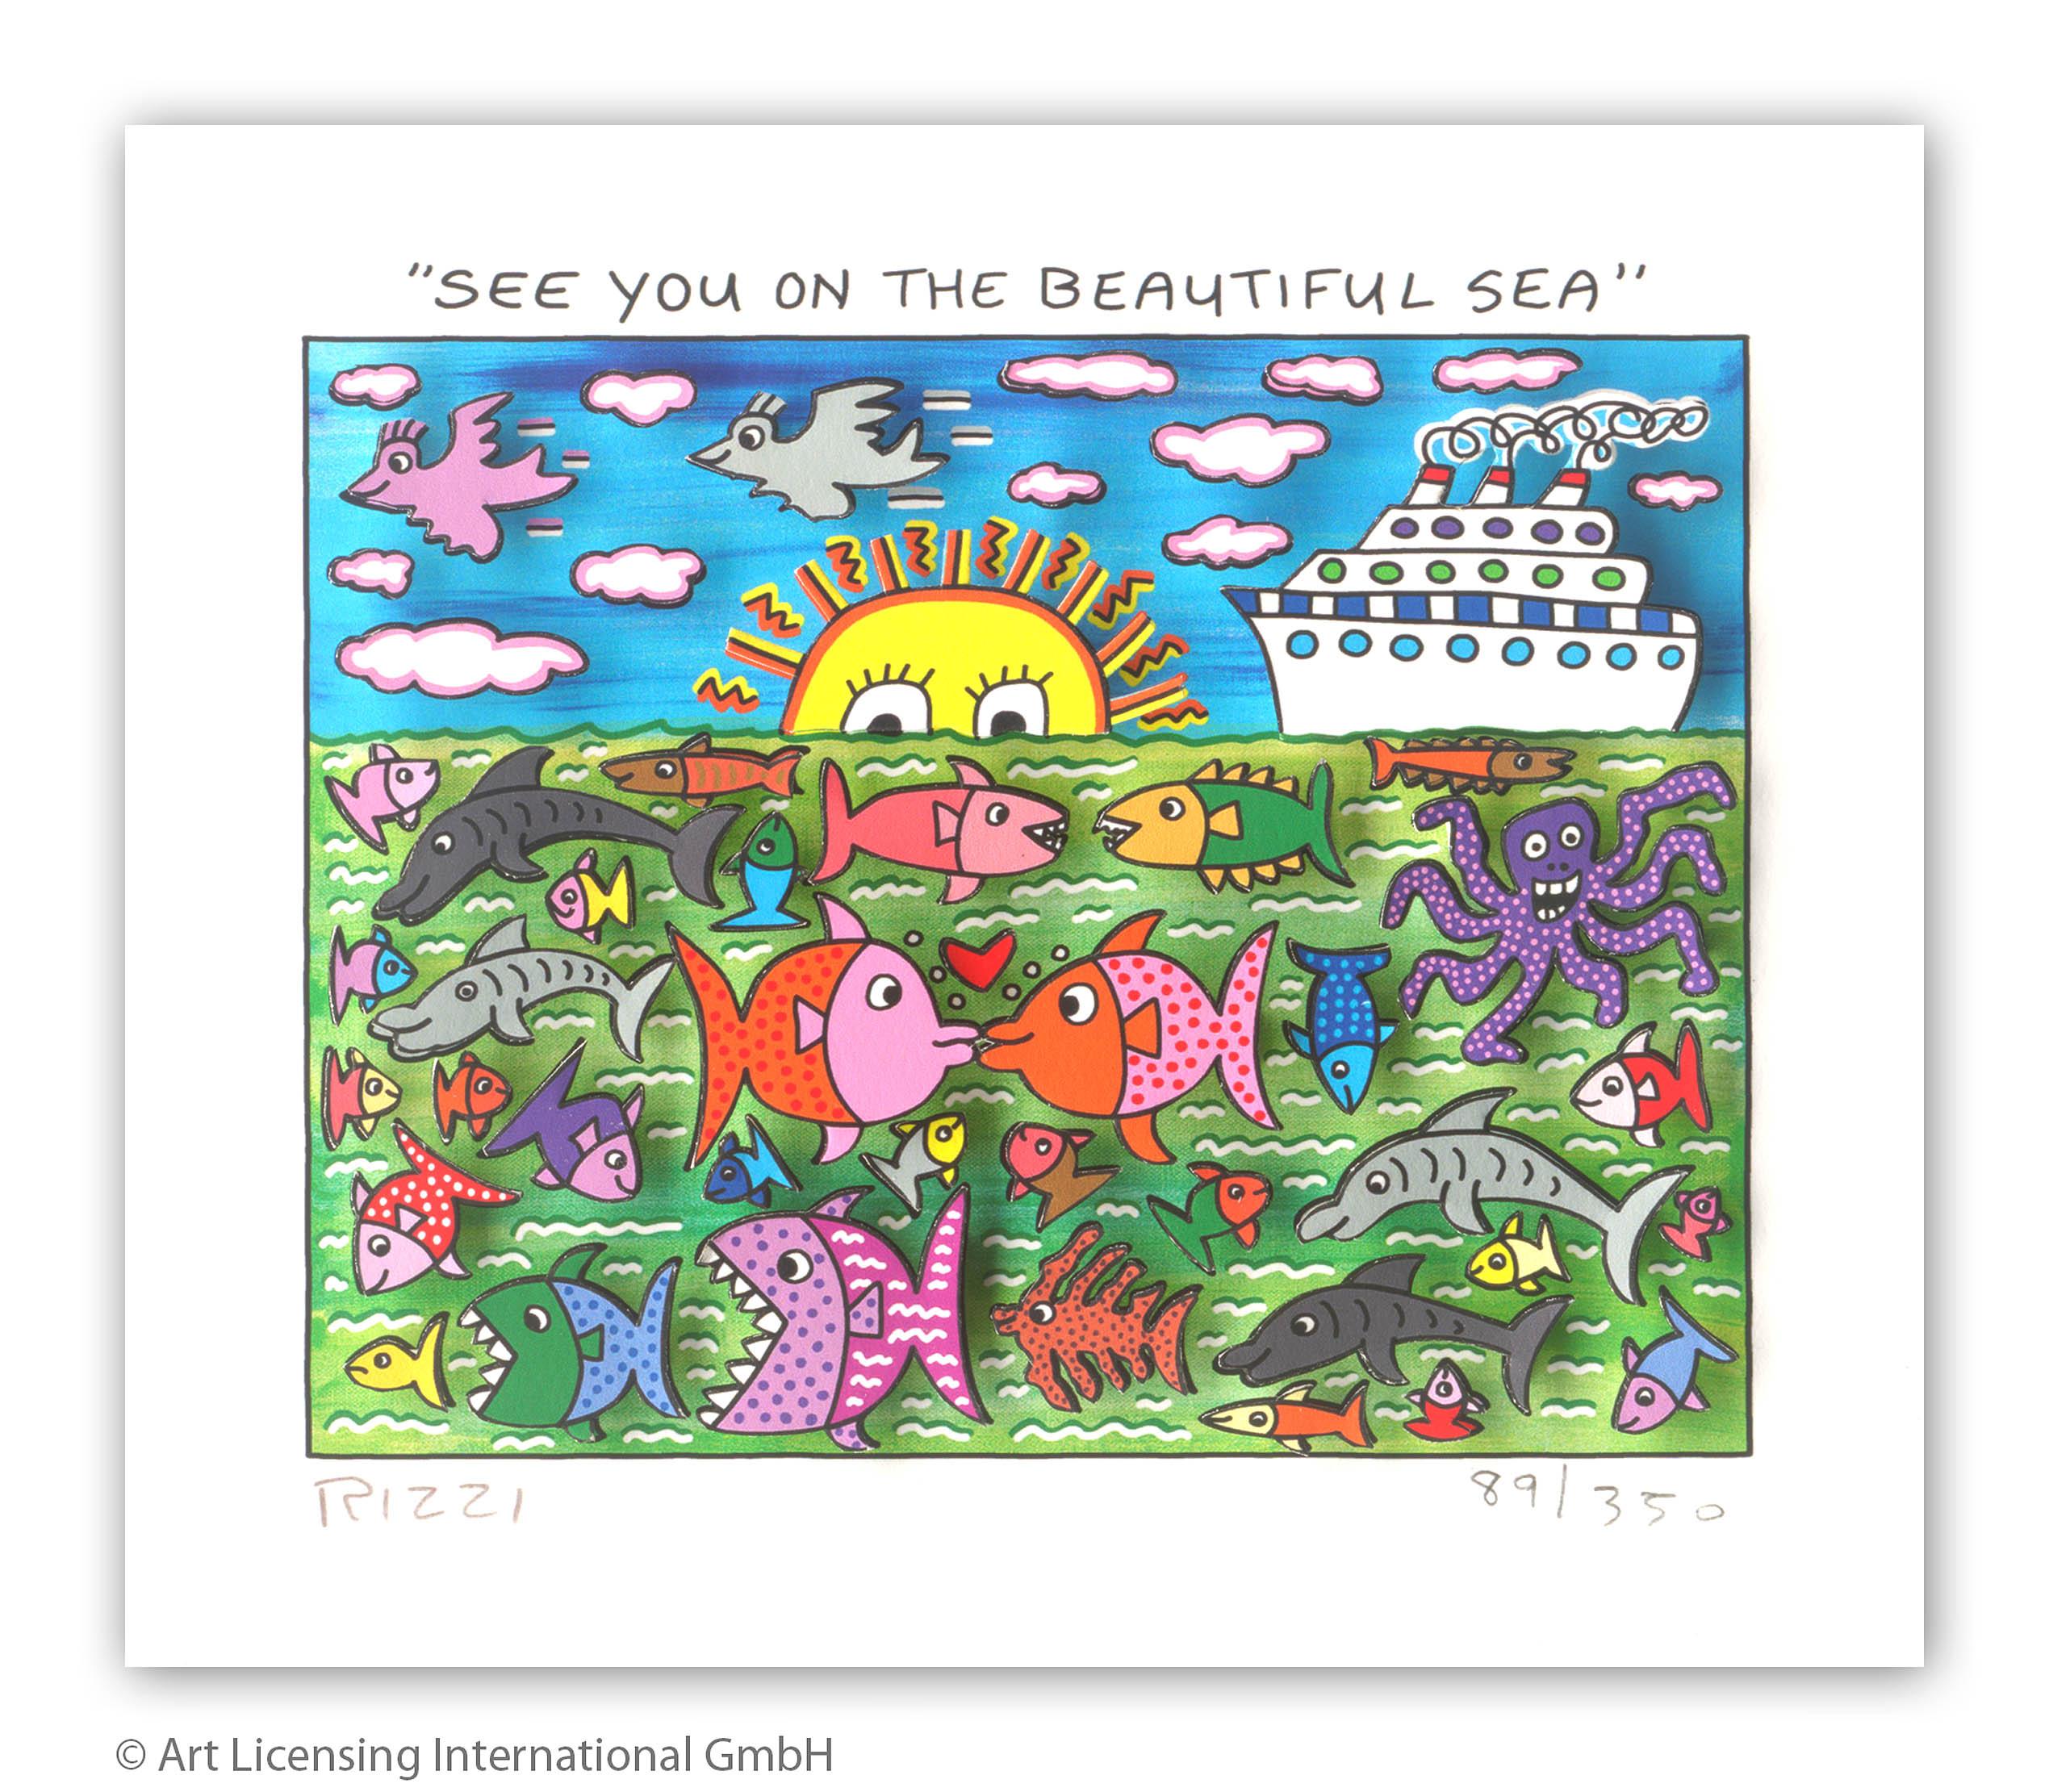 James Rizzi - SEE YOU ON THE BEAUTIFUL SEA - Original 3D Bild